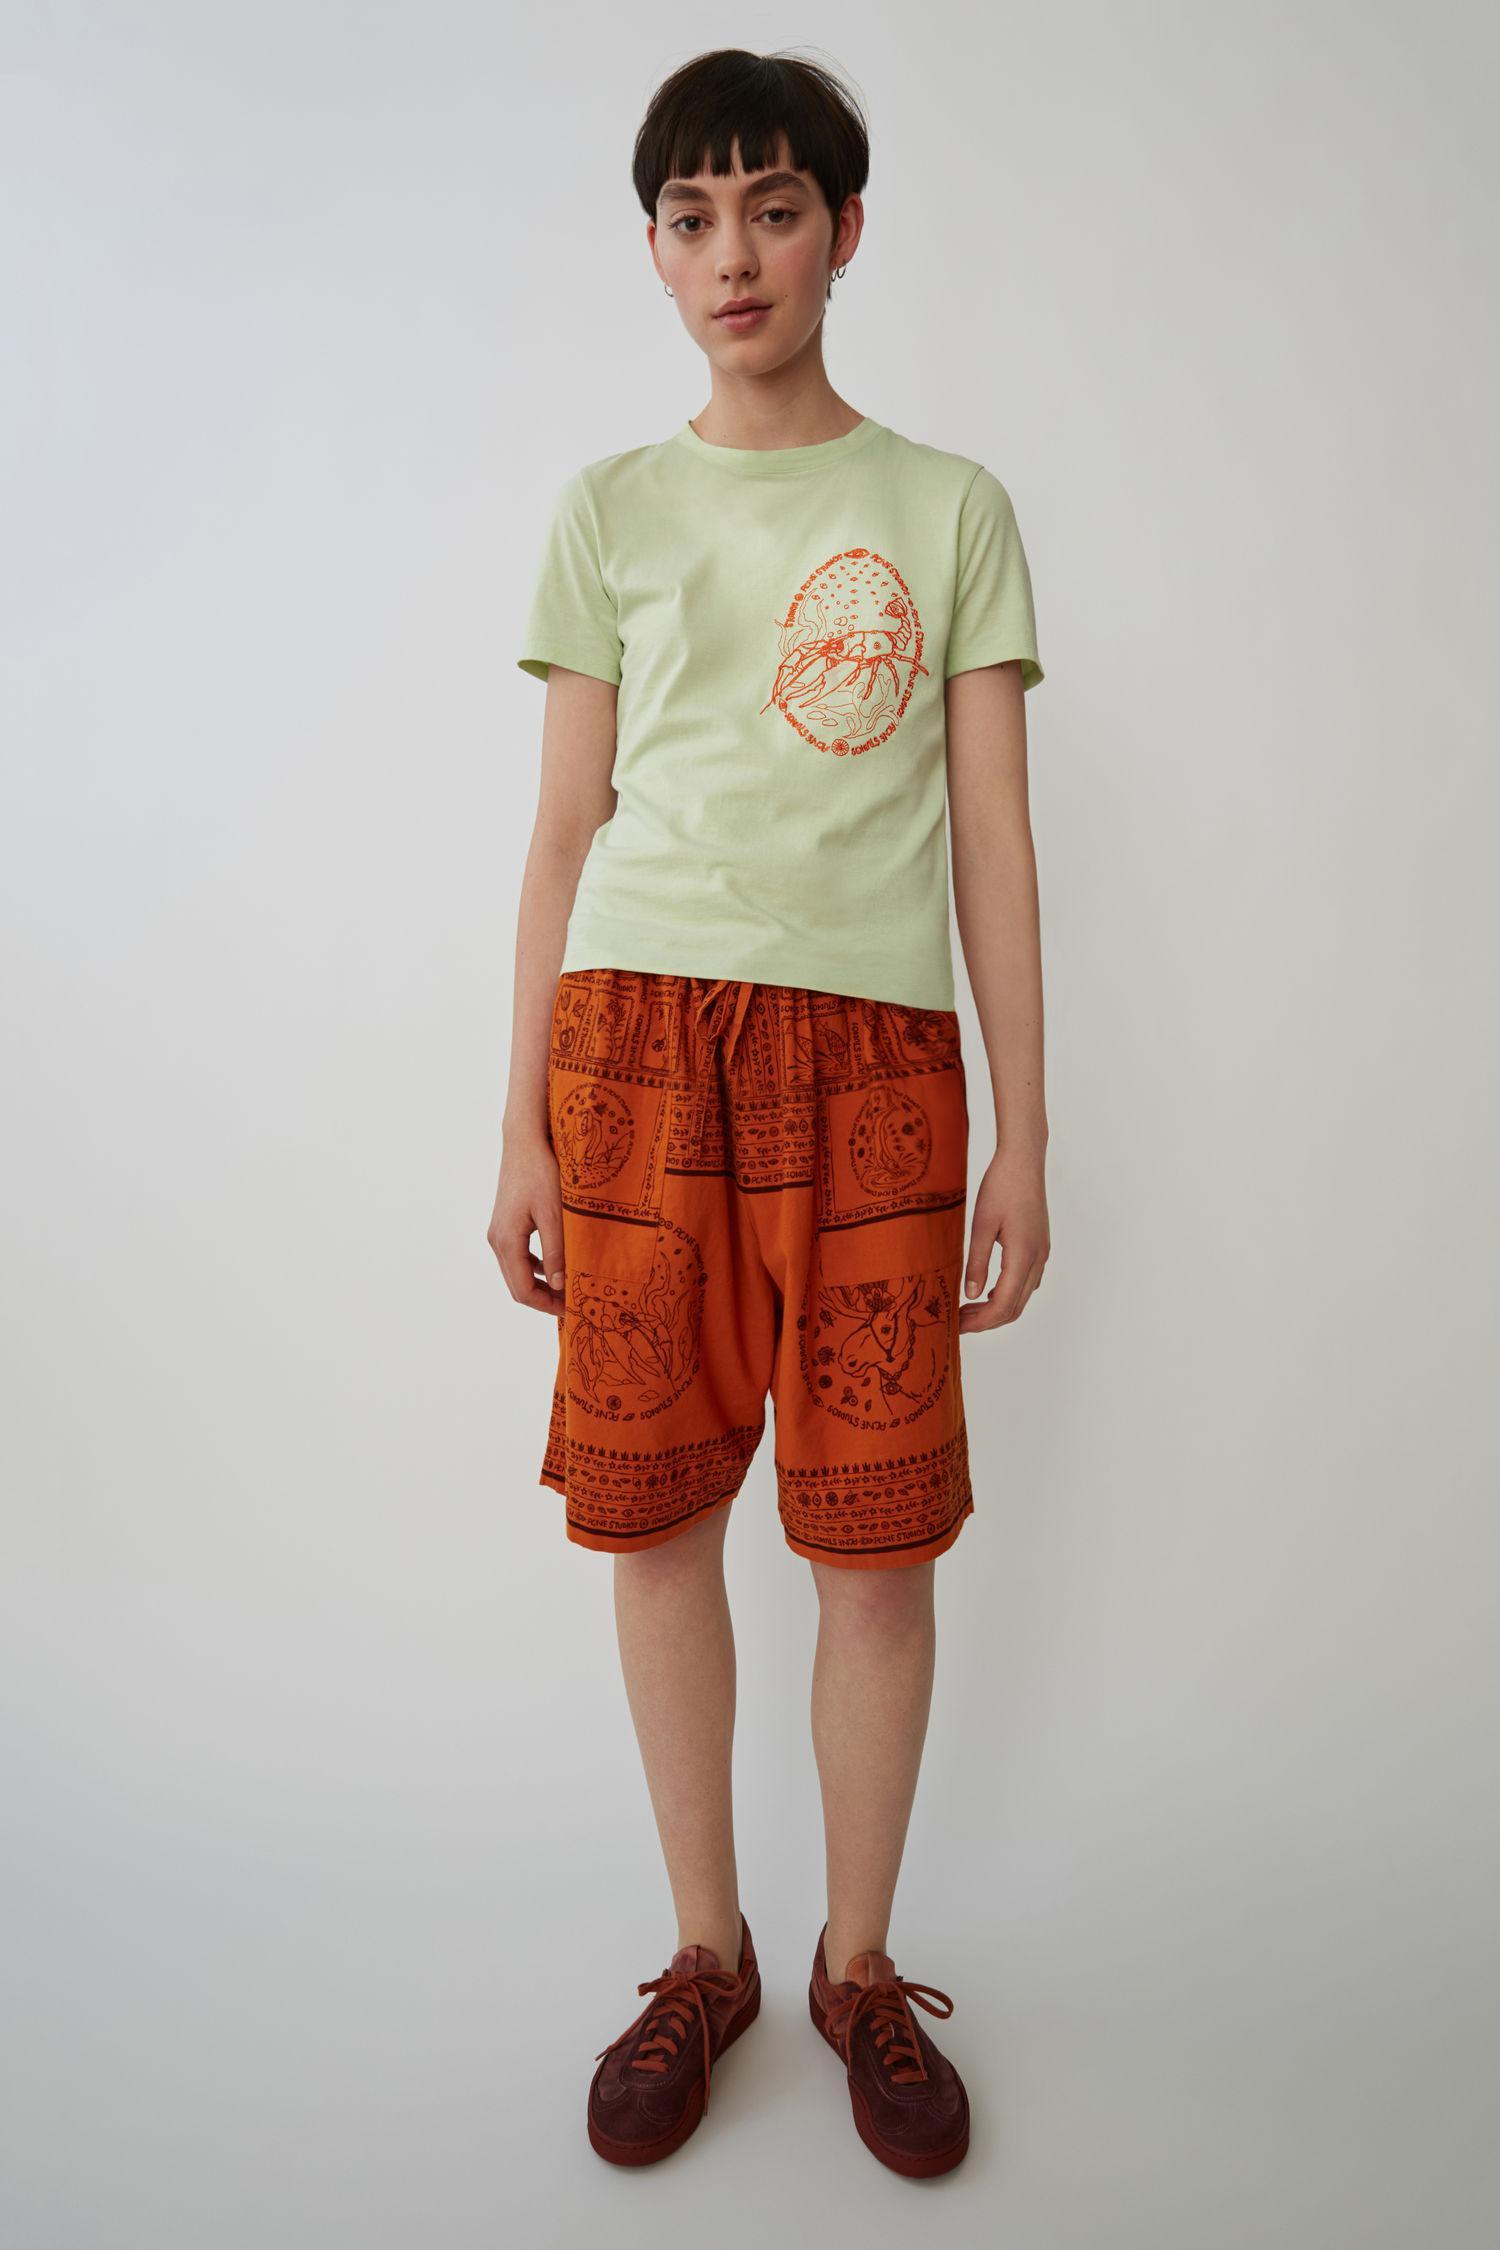 fbe9de63 Acne Studios Yoga T-shirt mint Green in Green for Men - Lyst